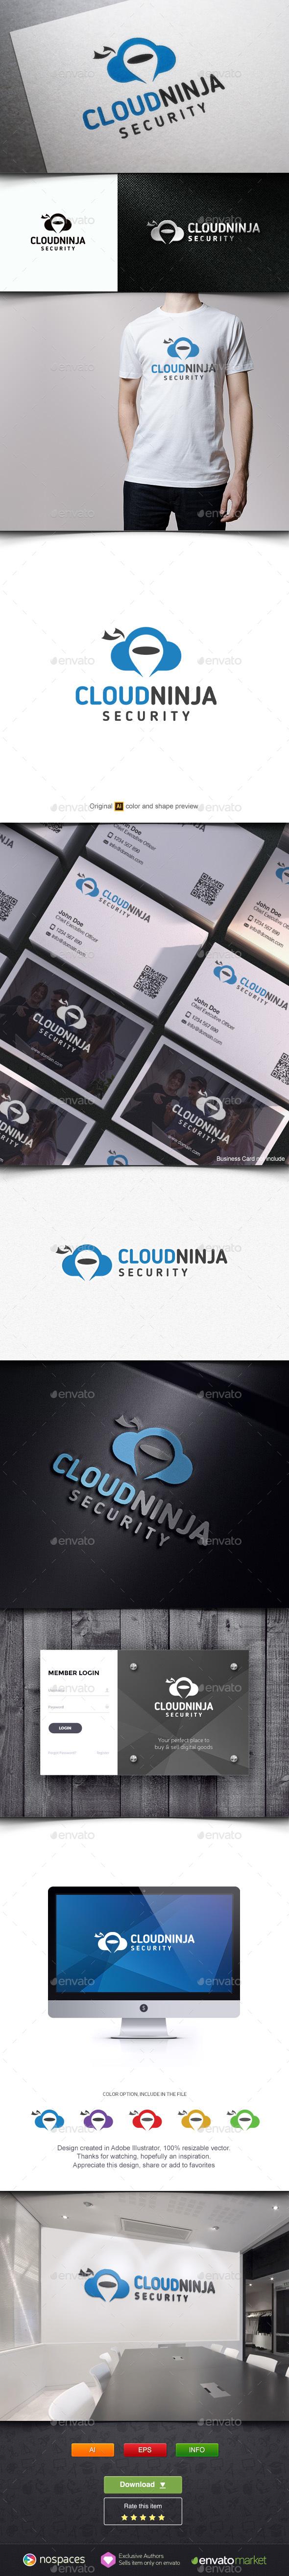 Cloud Ninja Logo - Objects Logo Templates